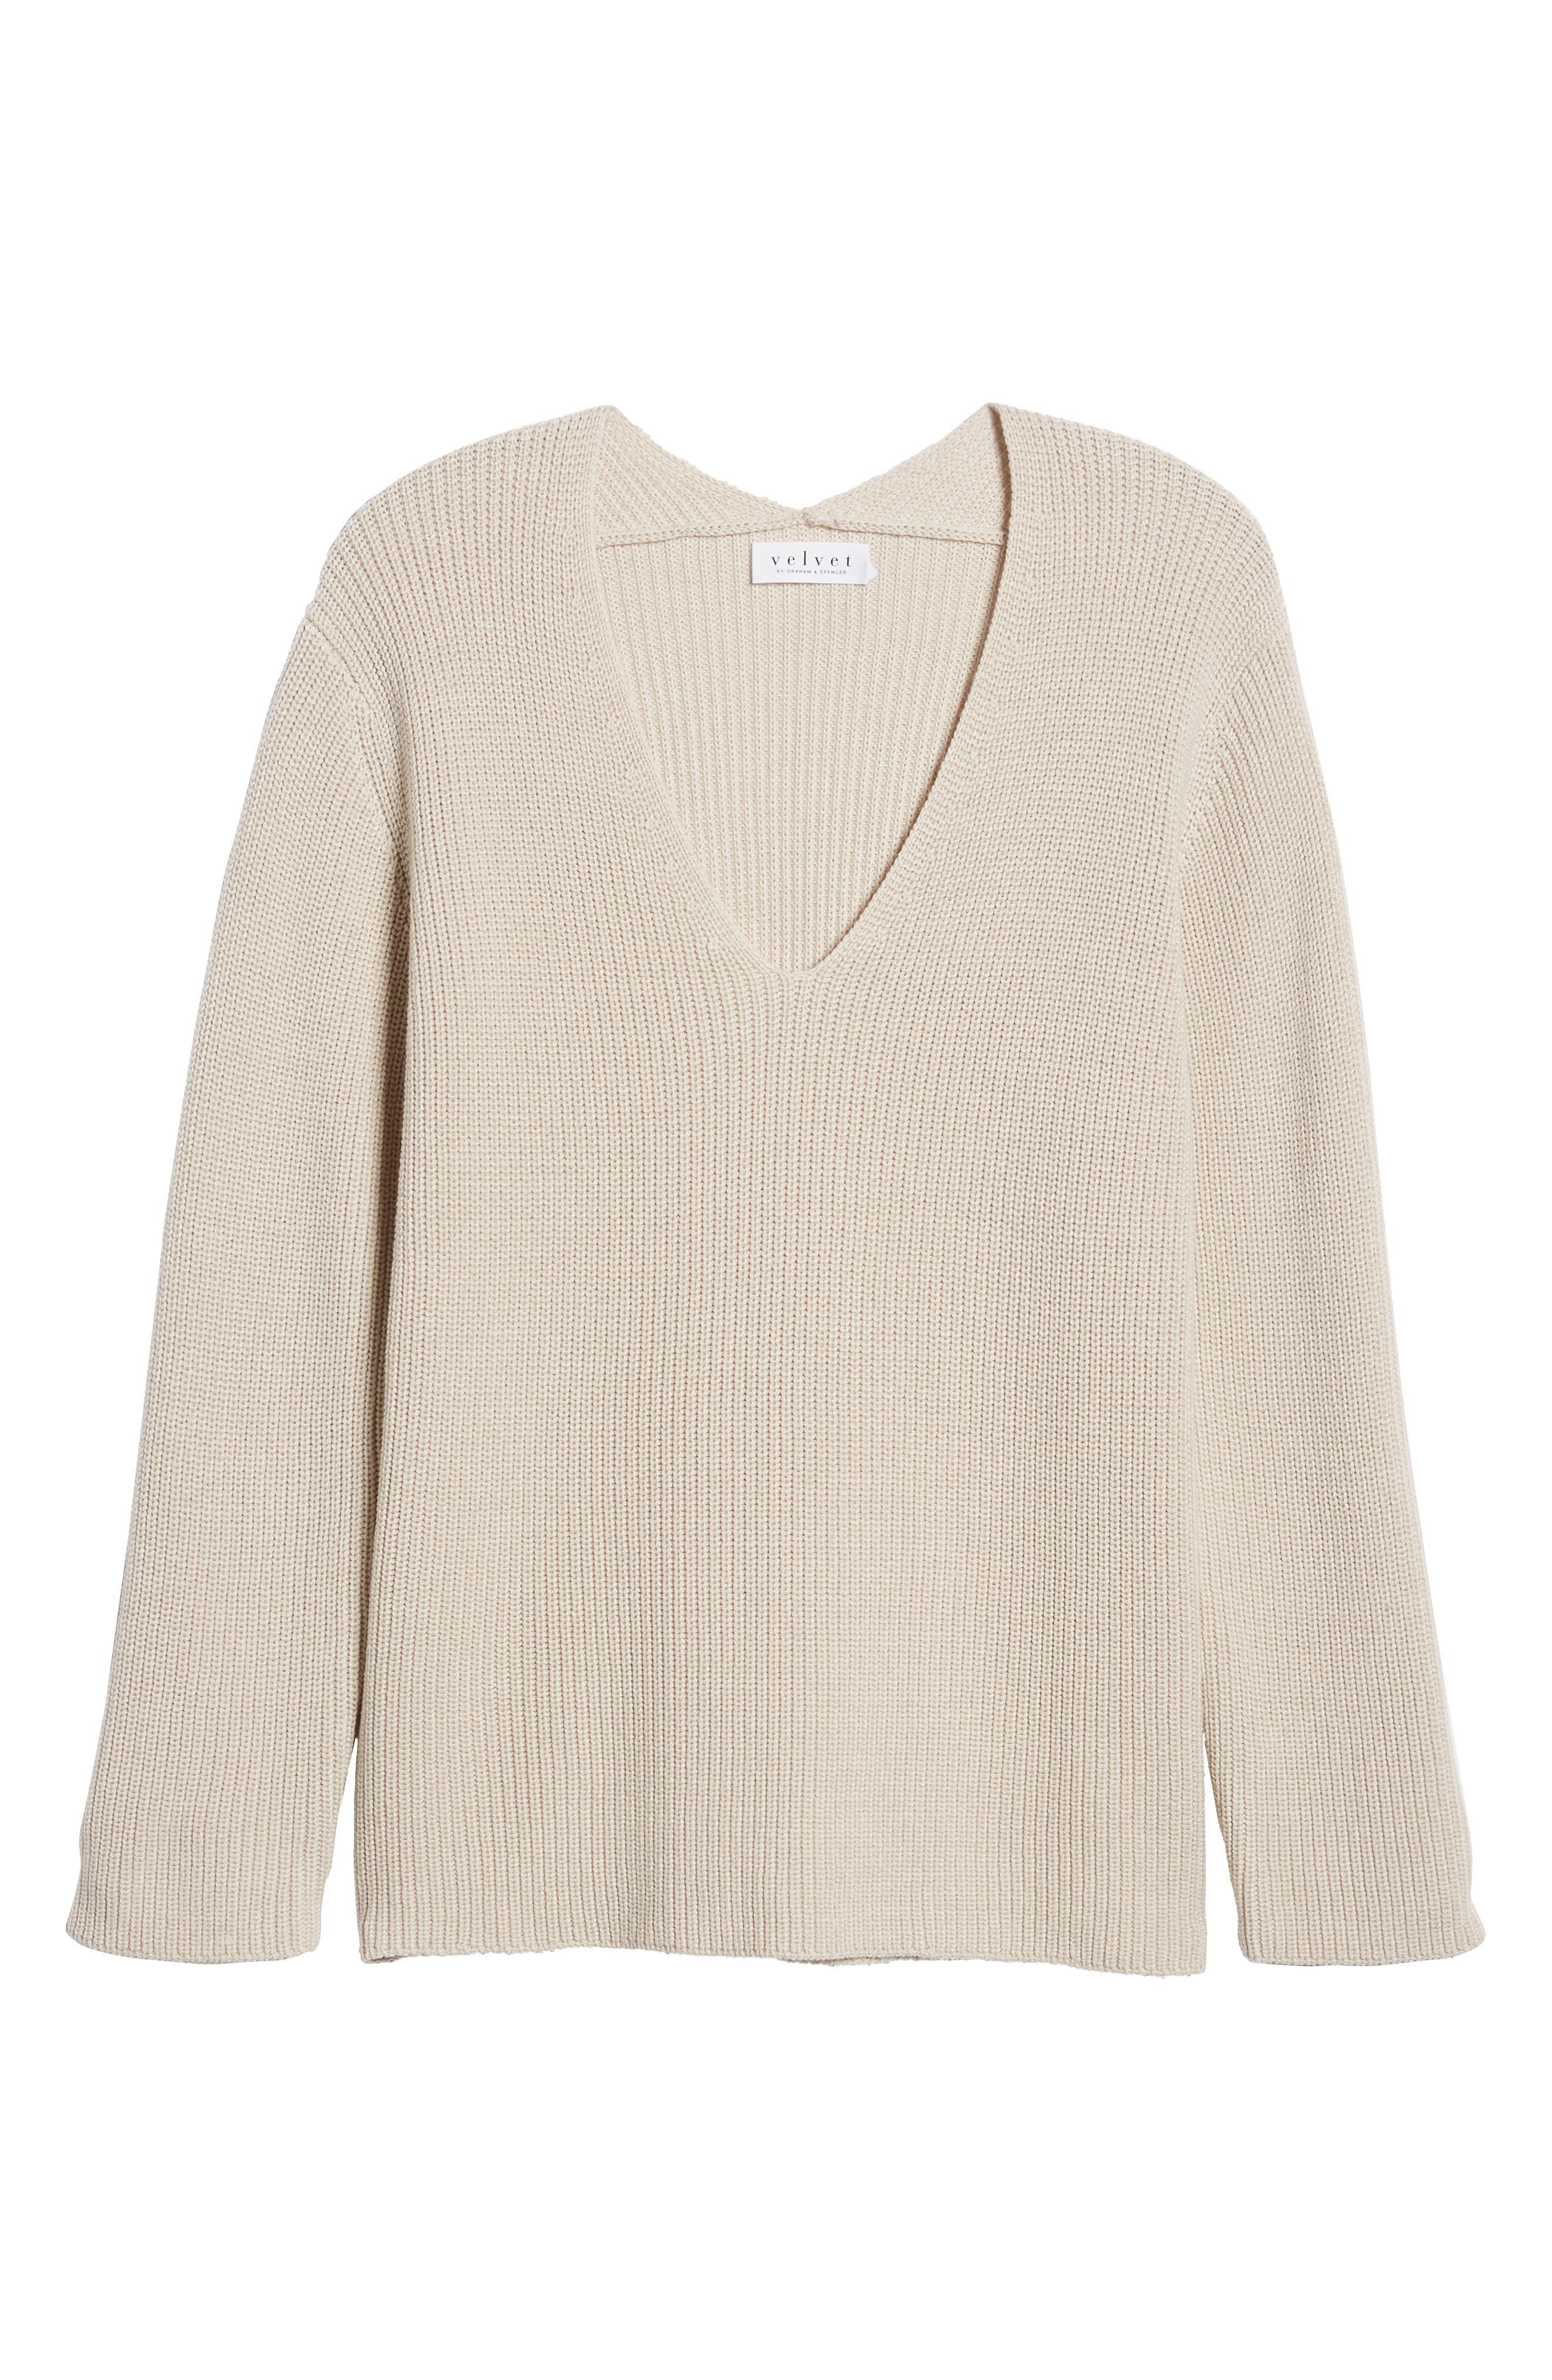 V-Neck Sweater,                             Alternate thumbnail 6, color,                             NUDE